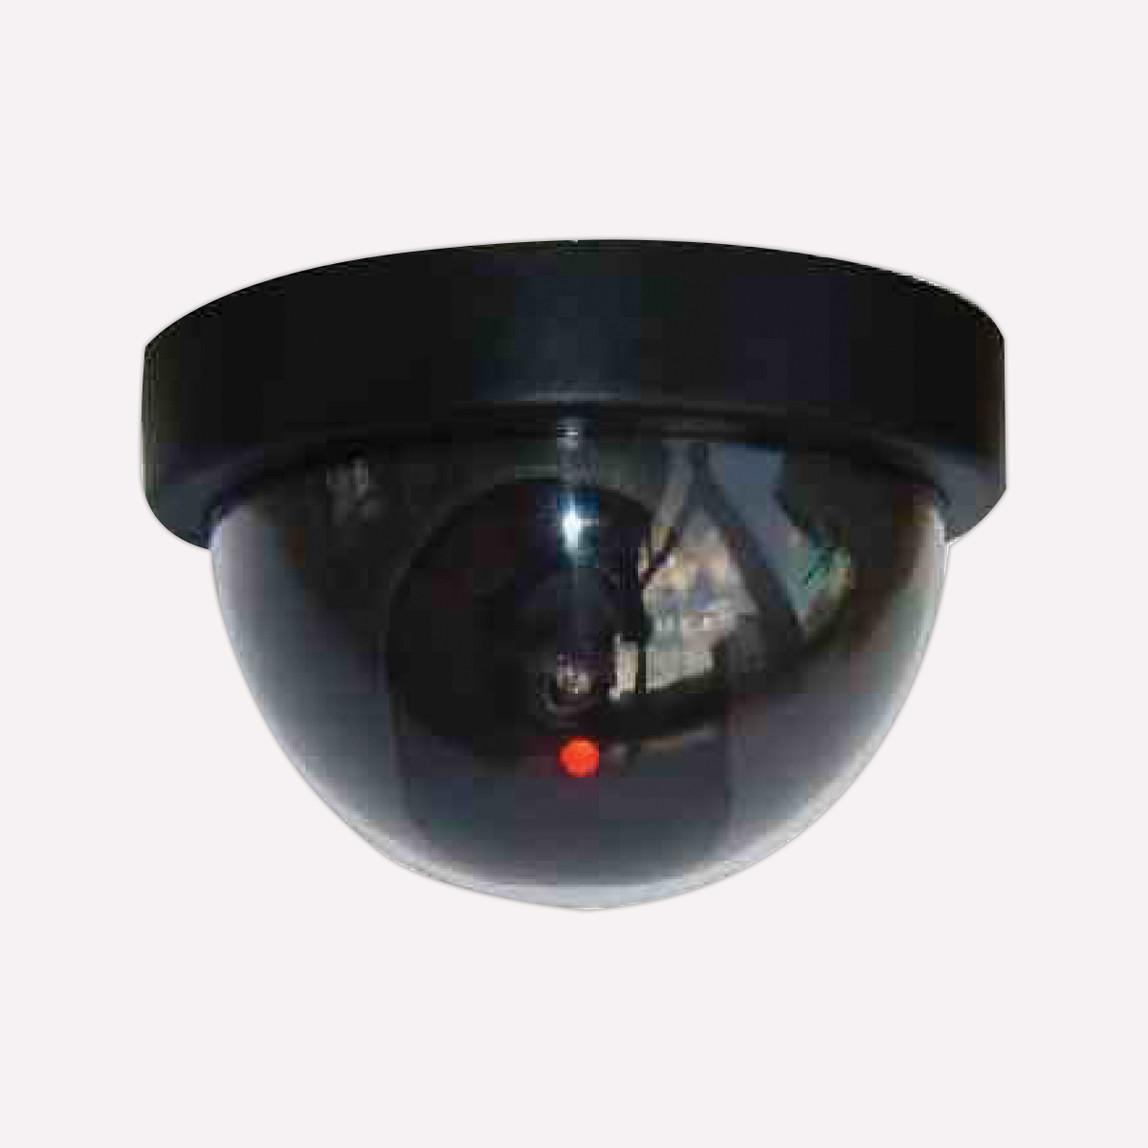 Promatic Caydırıcı Dome Kamera PR-CK04A